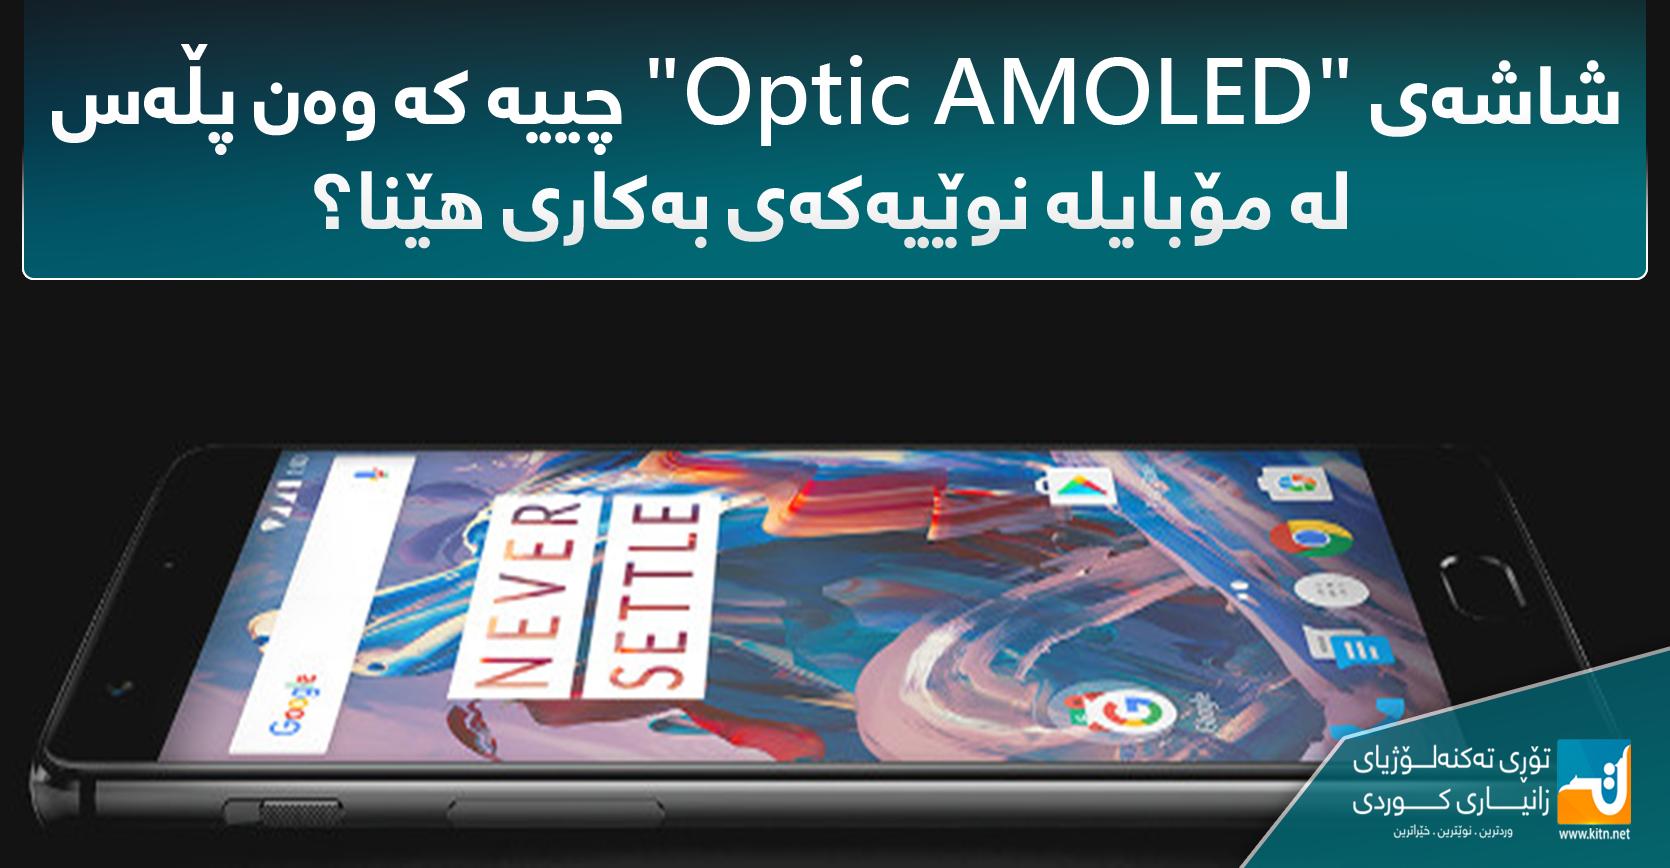 Optic-AMOLED-KITN.net